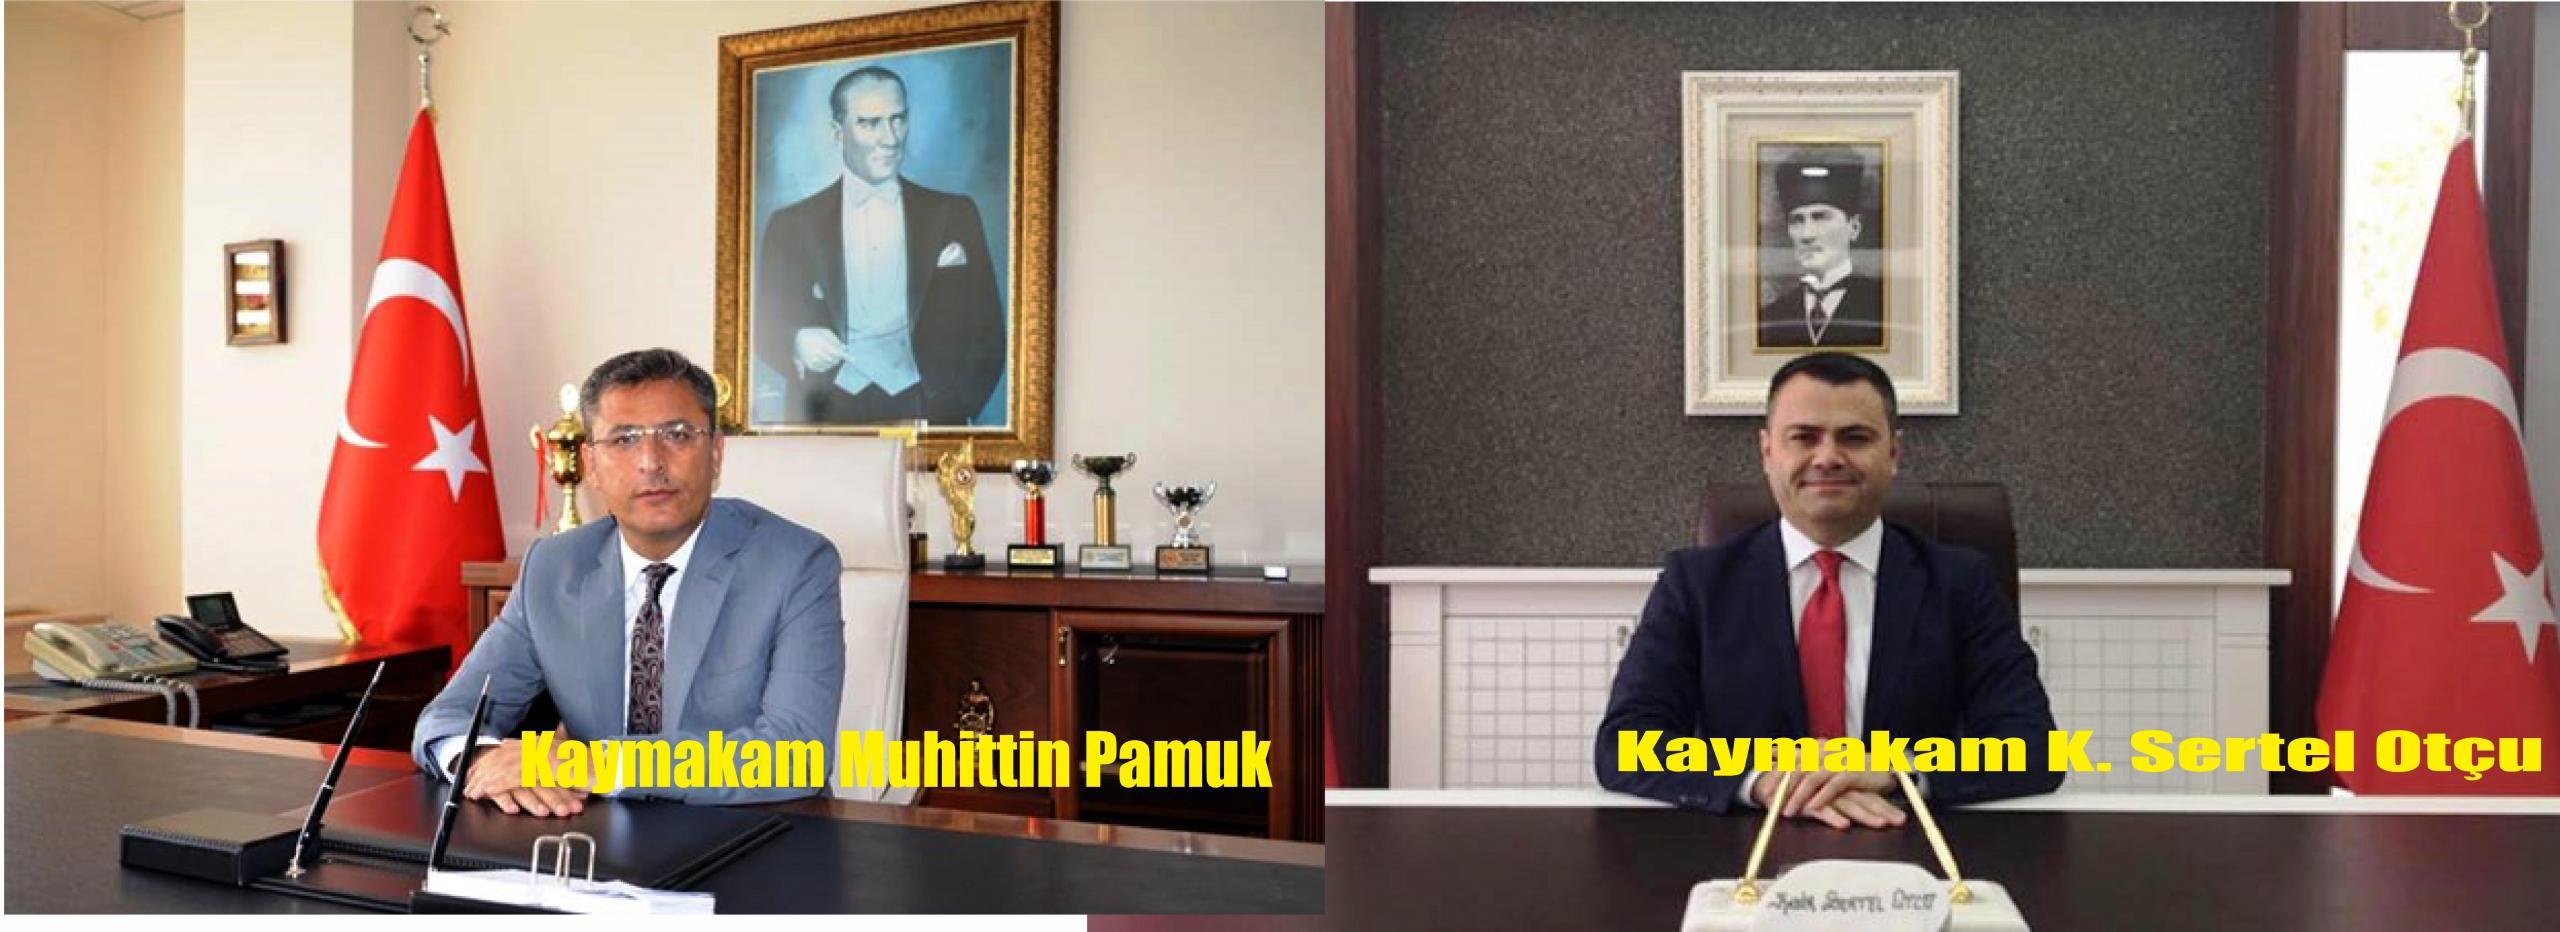 TARSUS KAYMAKAMI İZNE AYRILDI